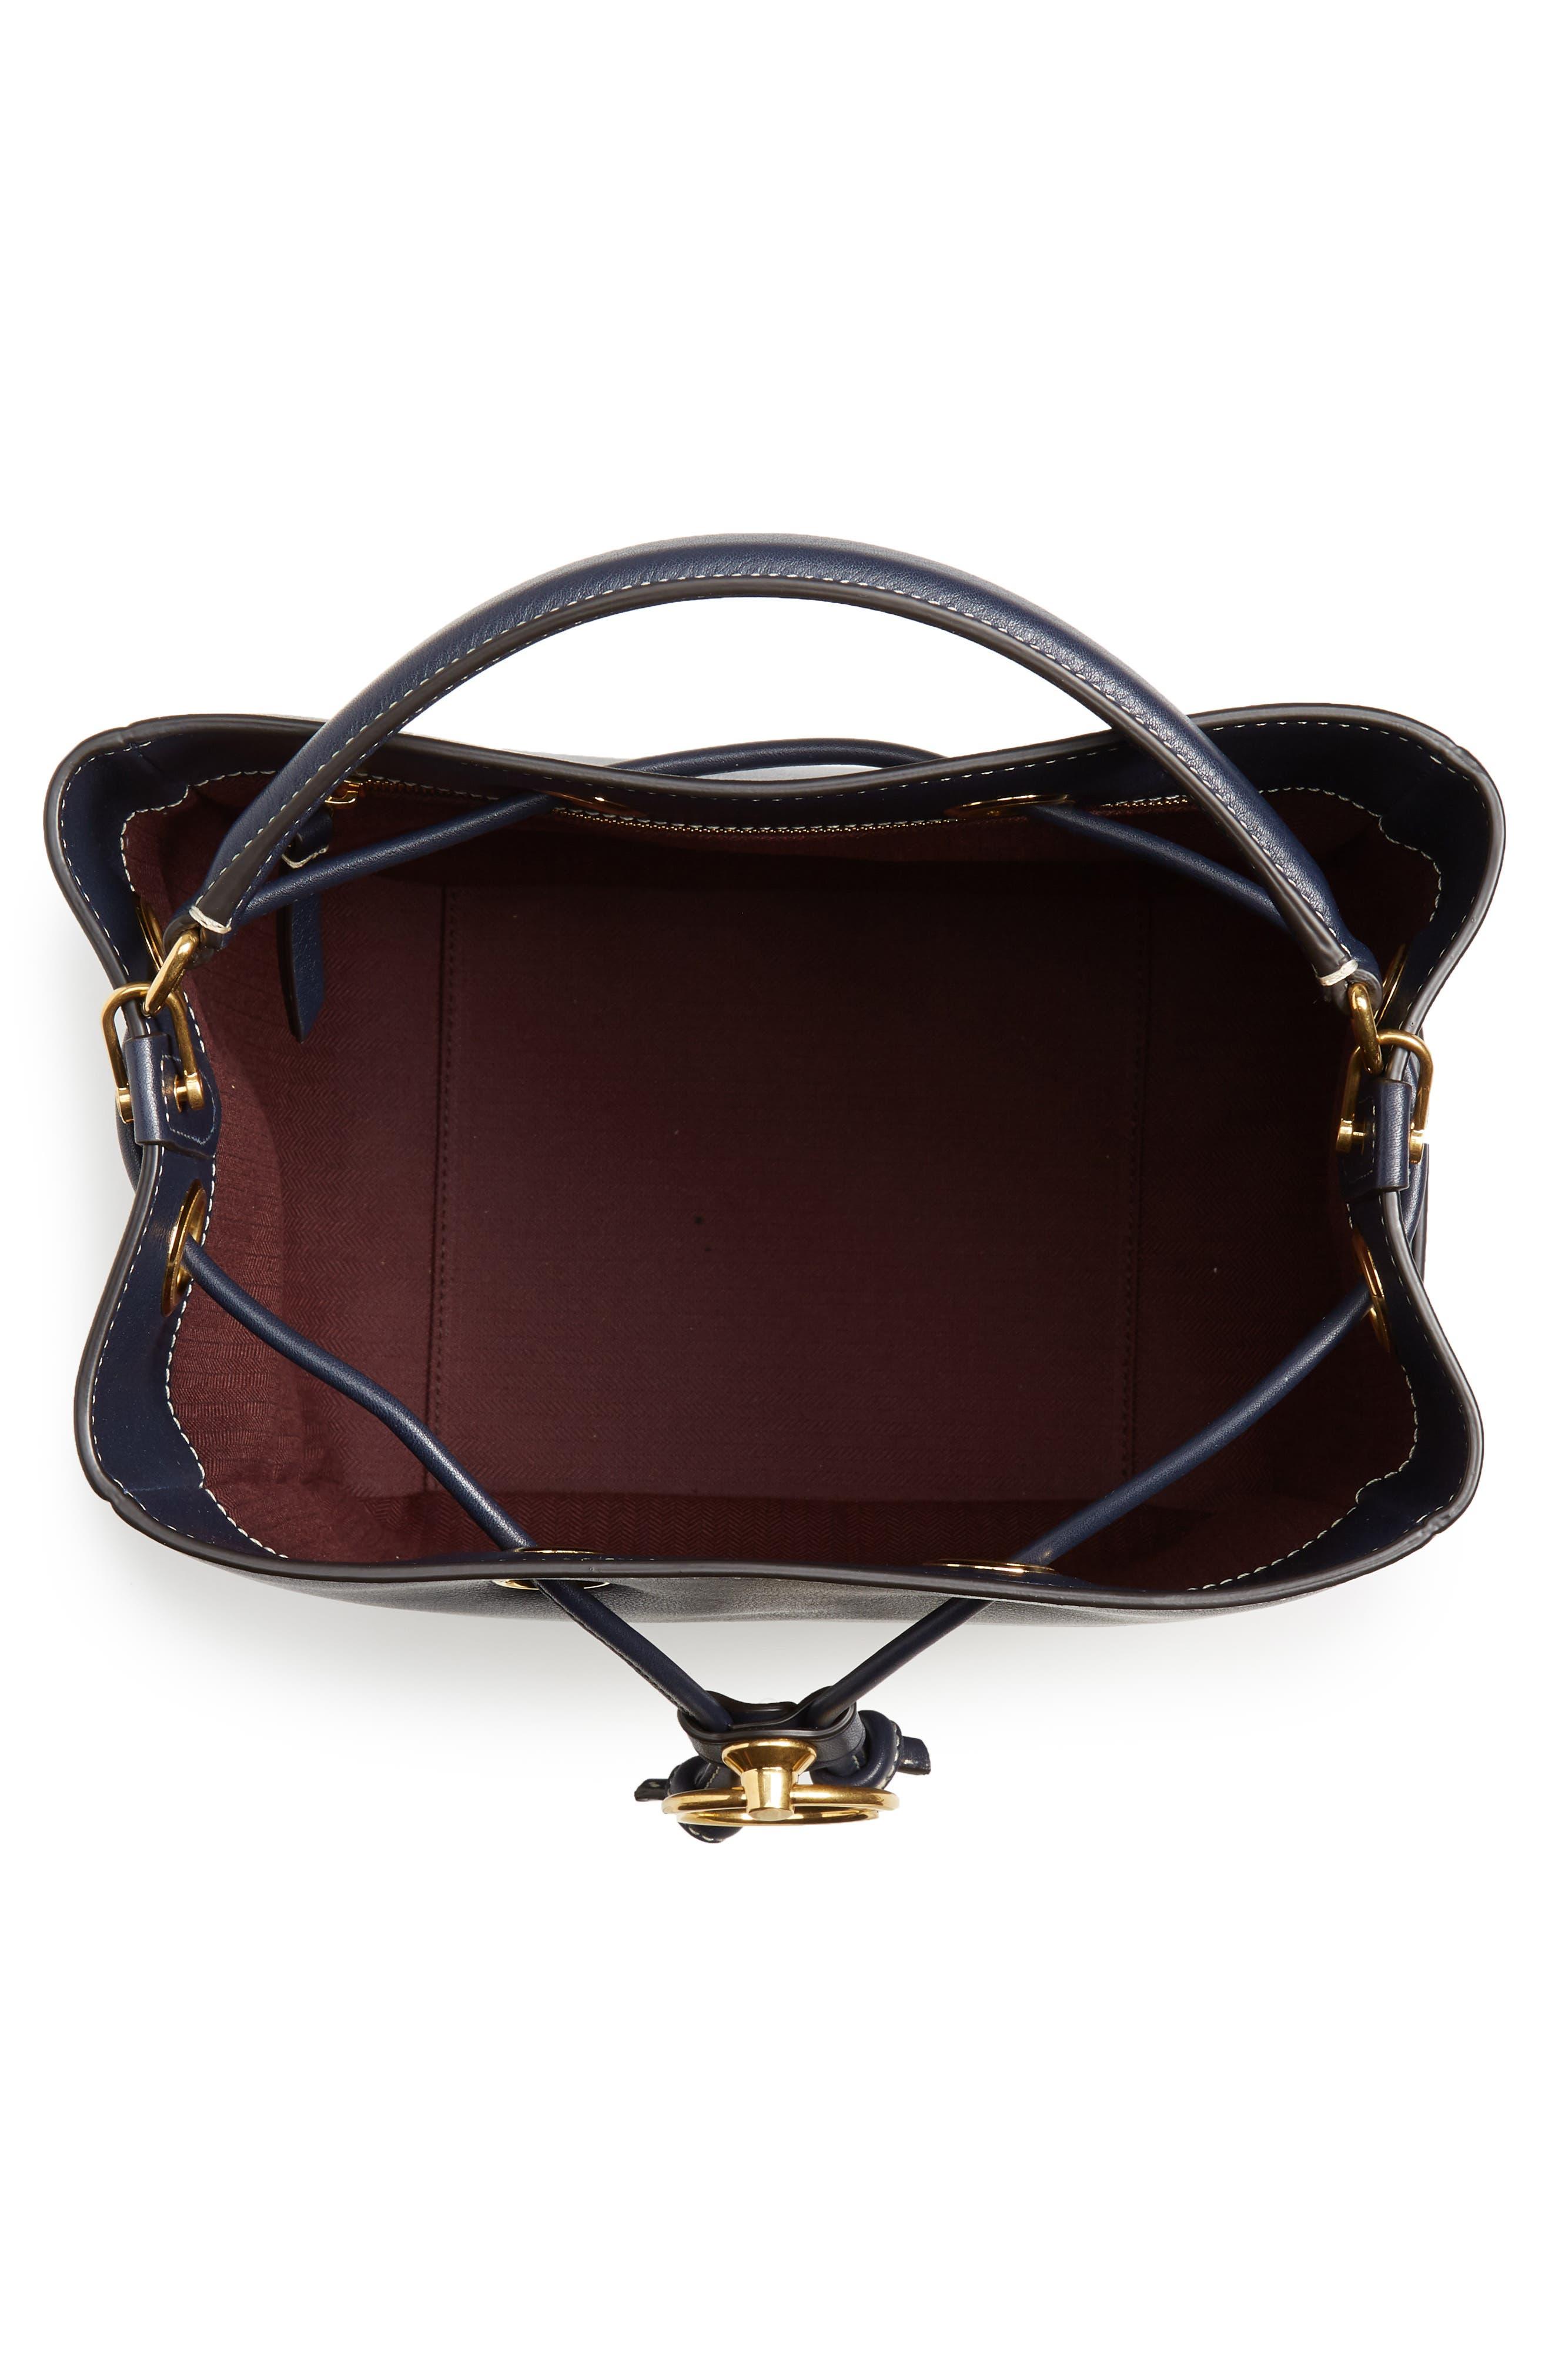 Hampstead Silky Calfskin Leather Bucket Bag,                             Alternate thumbnail 4, color,                             MIDNIGHT